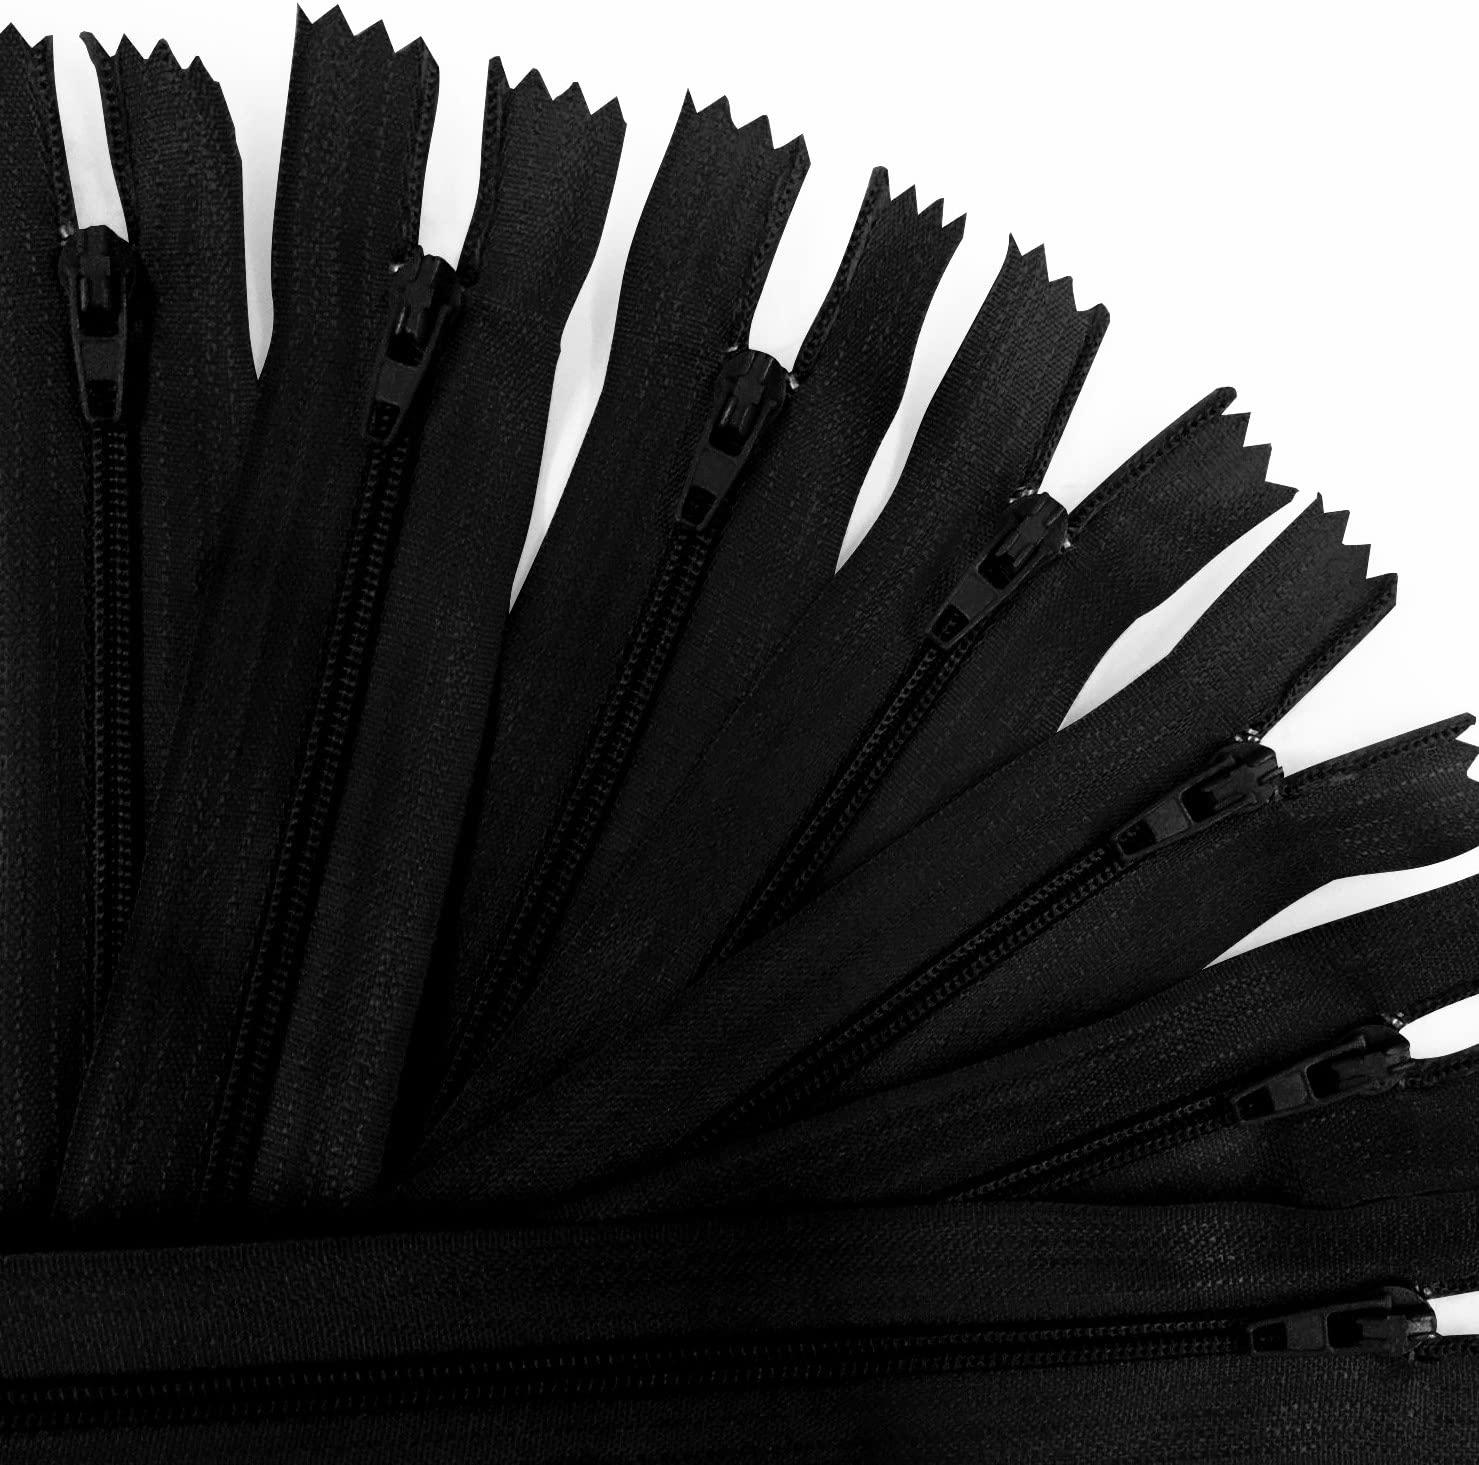 KGS 12 inch Nylon Zipper Zipper | 100 Zippers/Pack (Black)